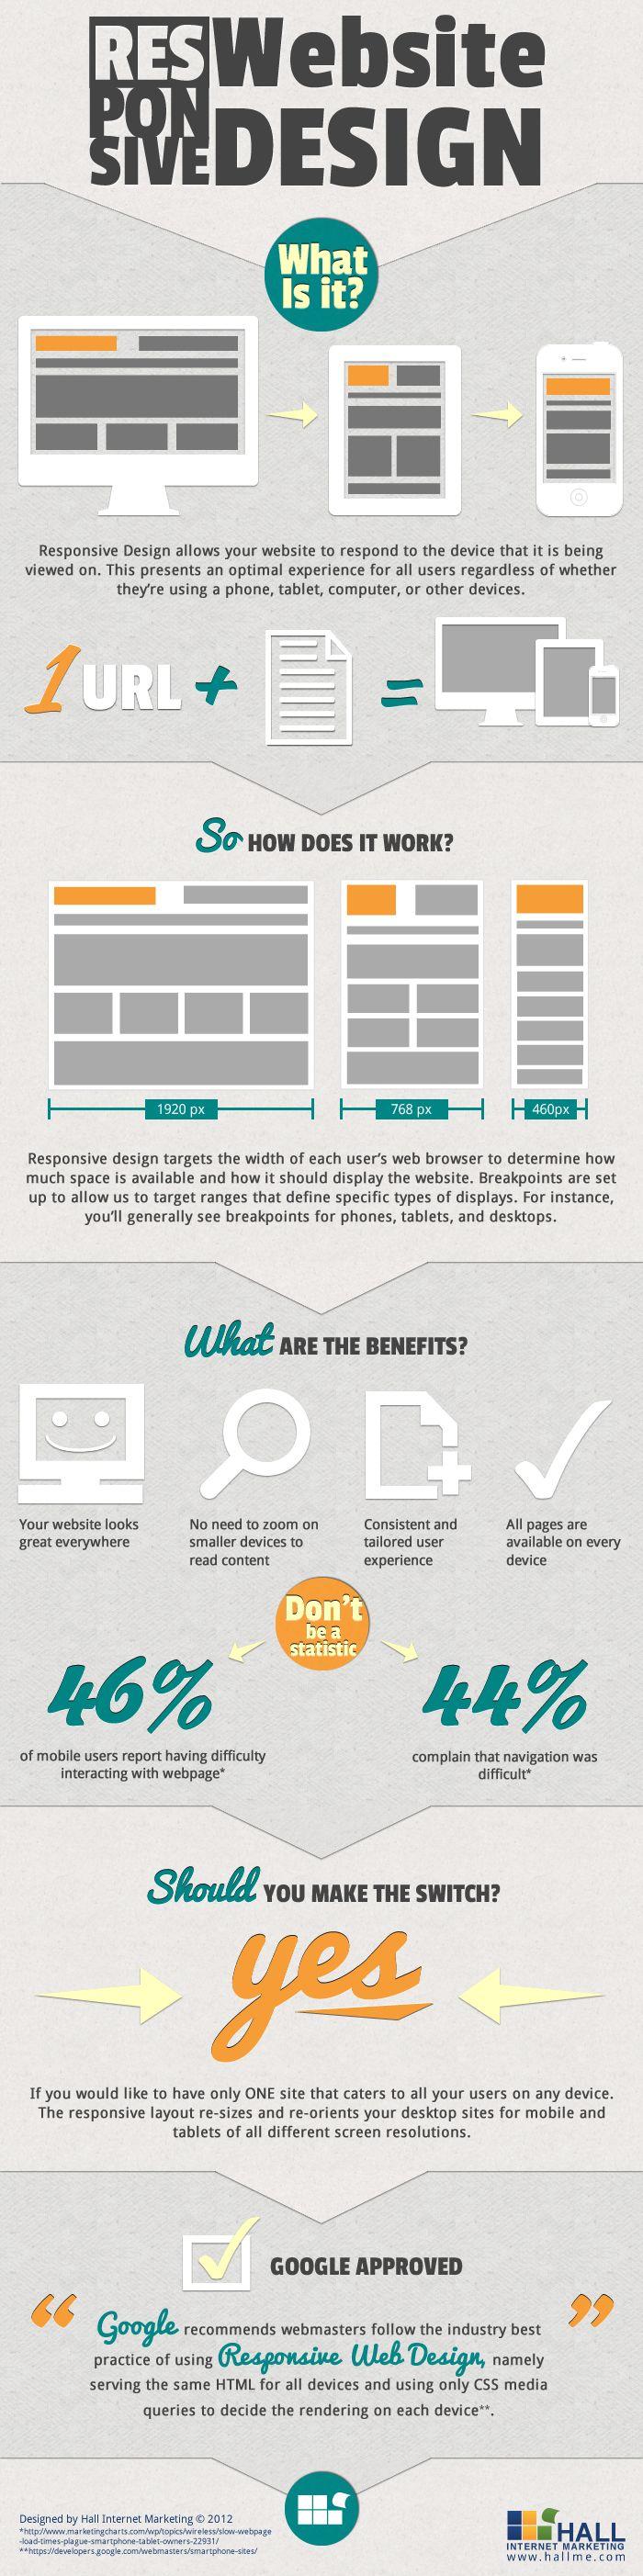 Responsive web design What is it? #infografia #infographic #design #internet